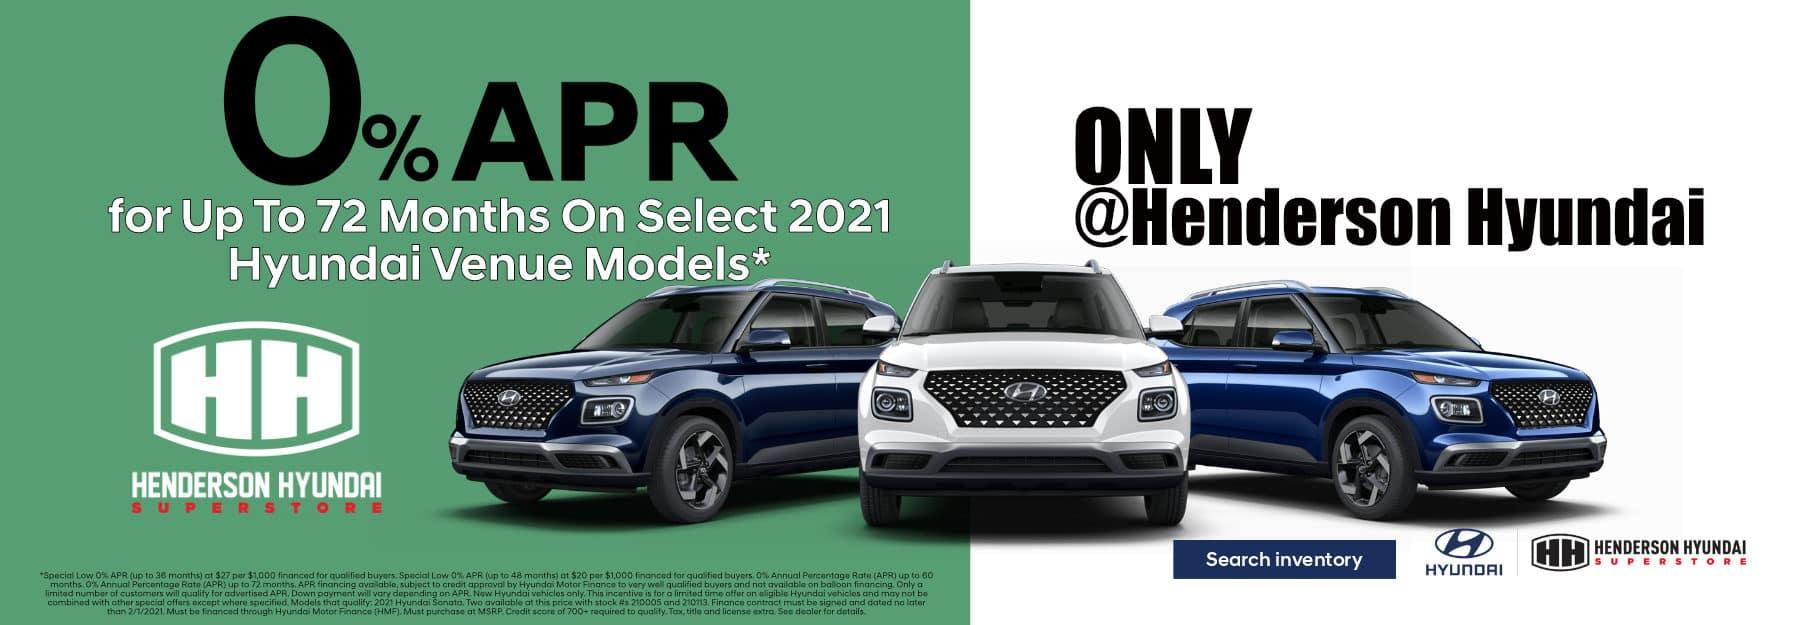 R_January 2021_Venue_General_Webslider_Henderson_Hyundai